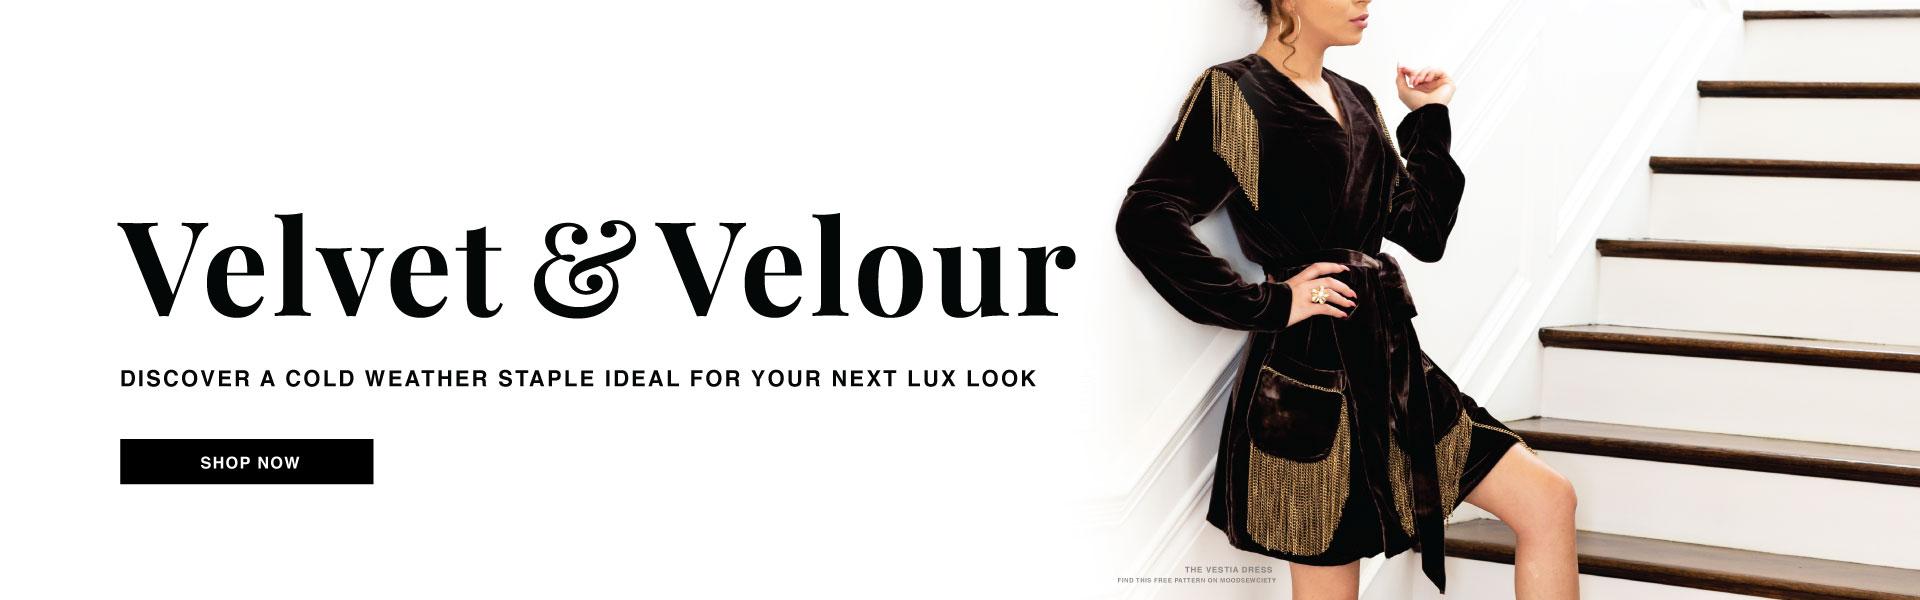 Shop Velvet Fabric and Velour Fabric